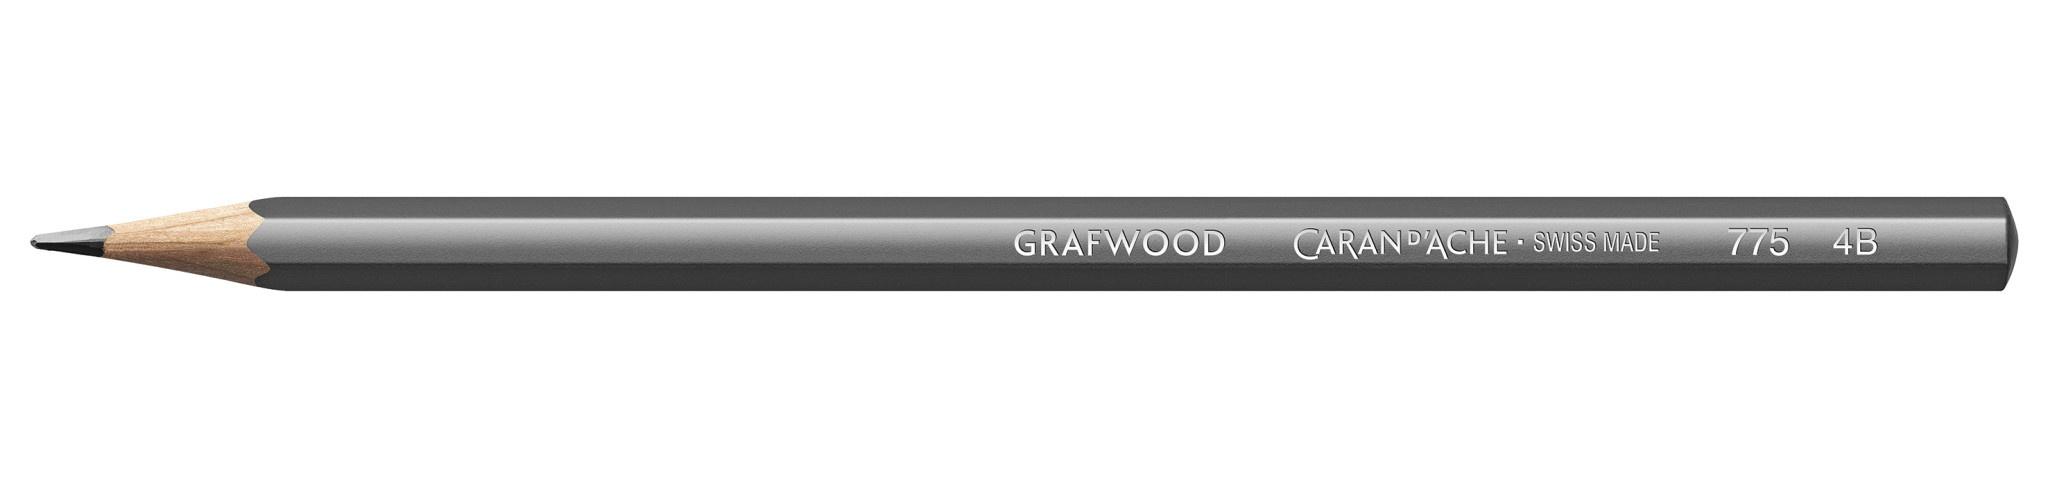 Caran d'Ache caran d'ache grafwood 4B